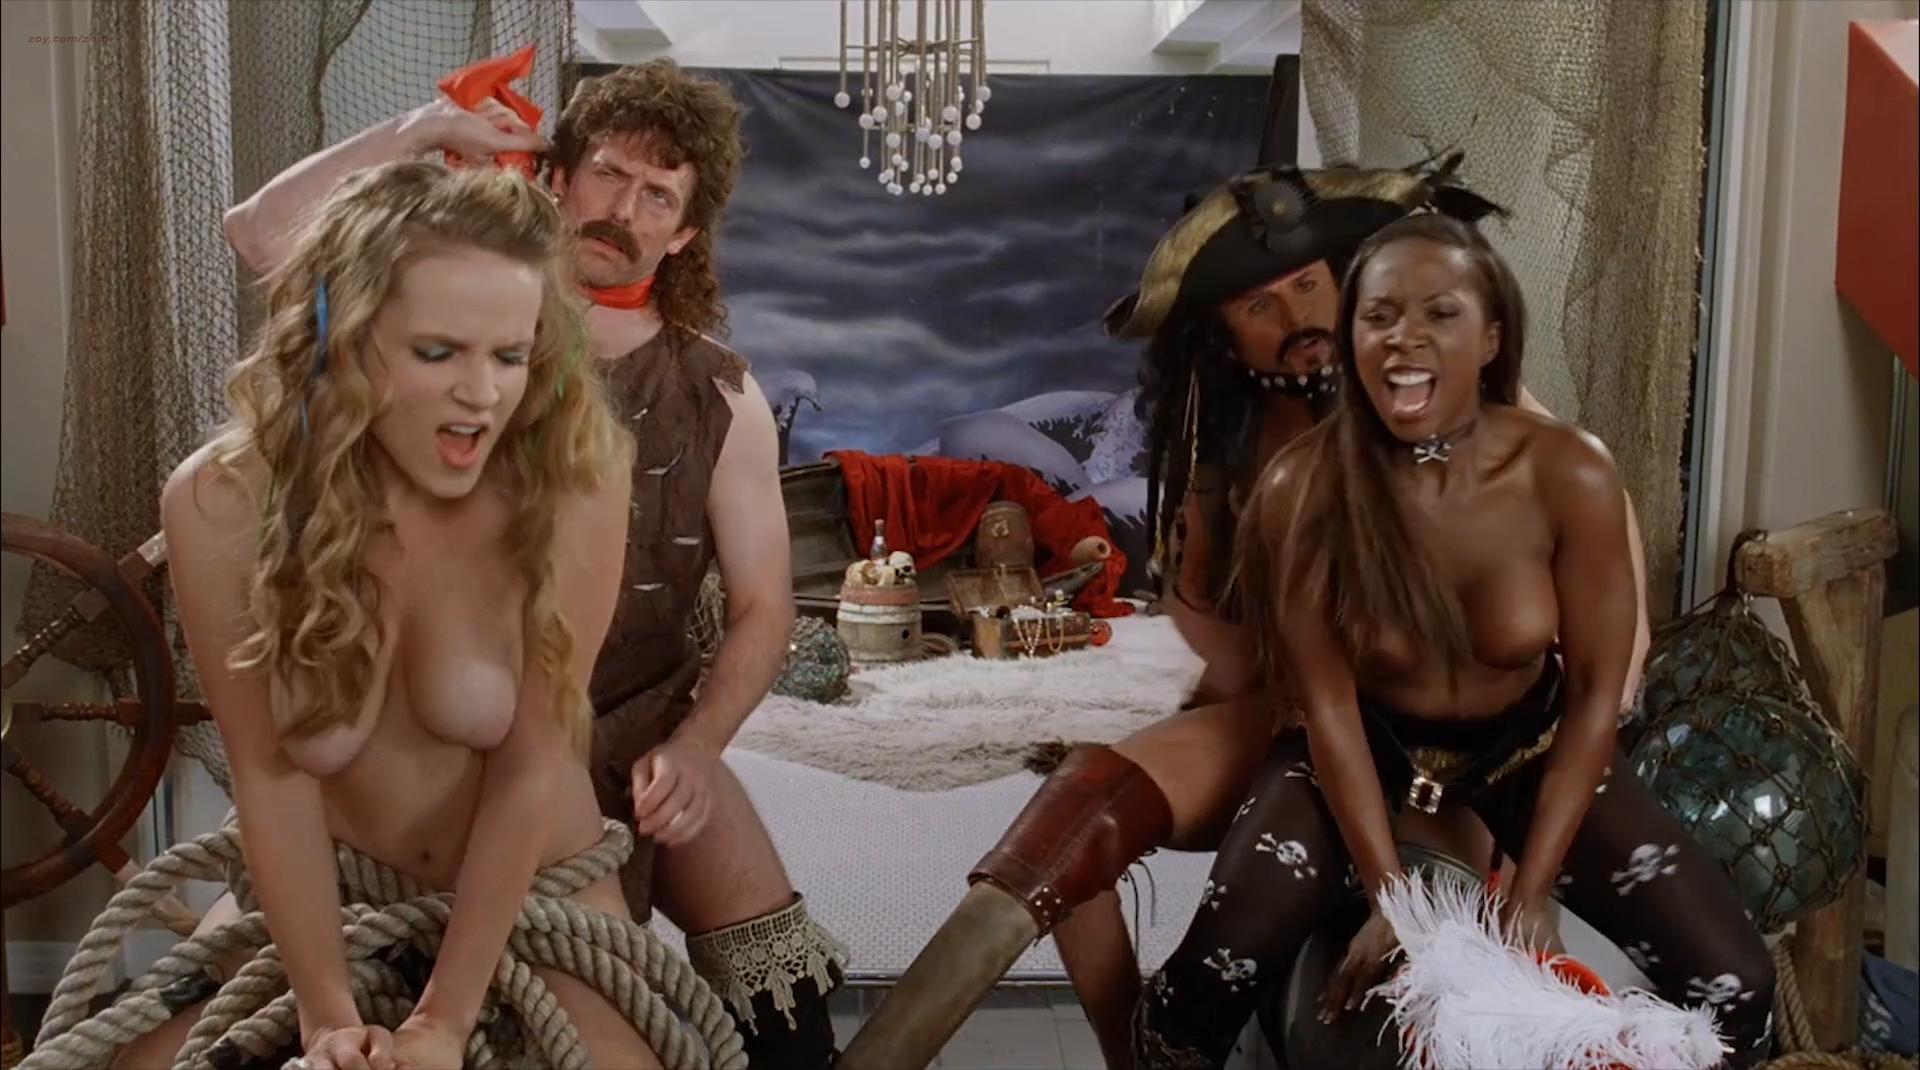 Olivia munn eurydice davis maja miletich freeloaders freeloaders celebrity posing hot nude topless hot sex